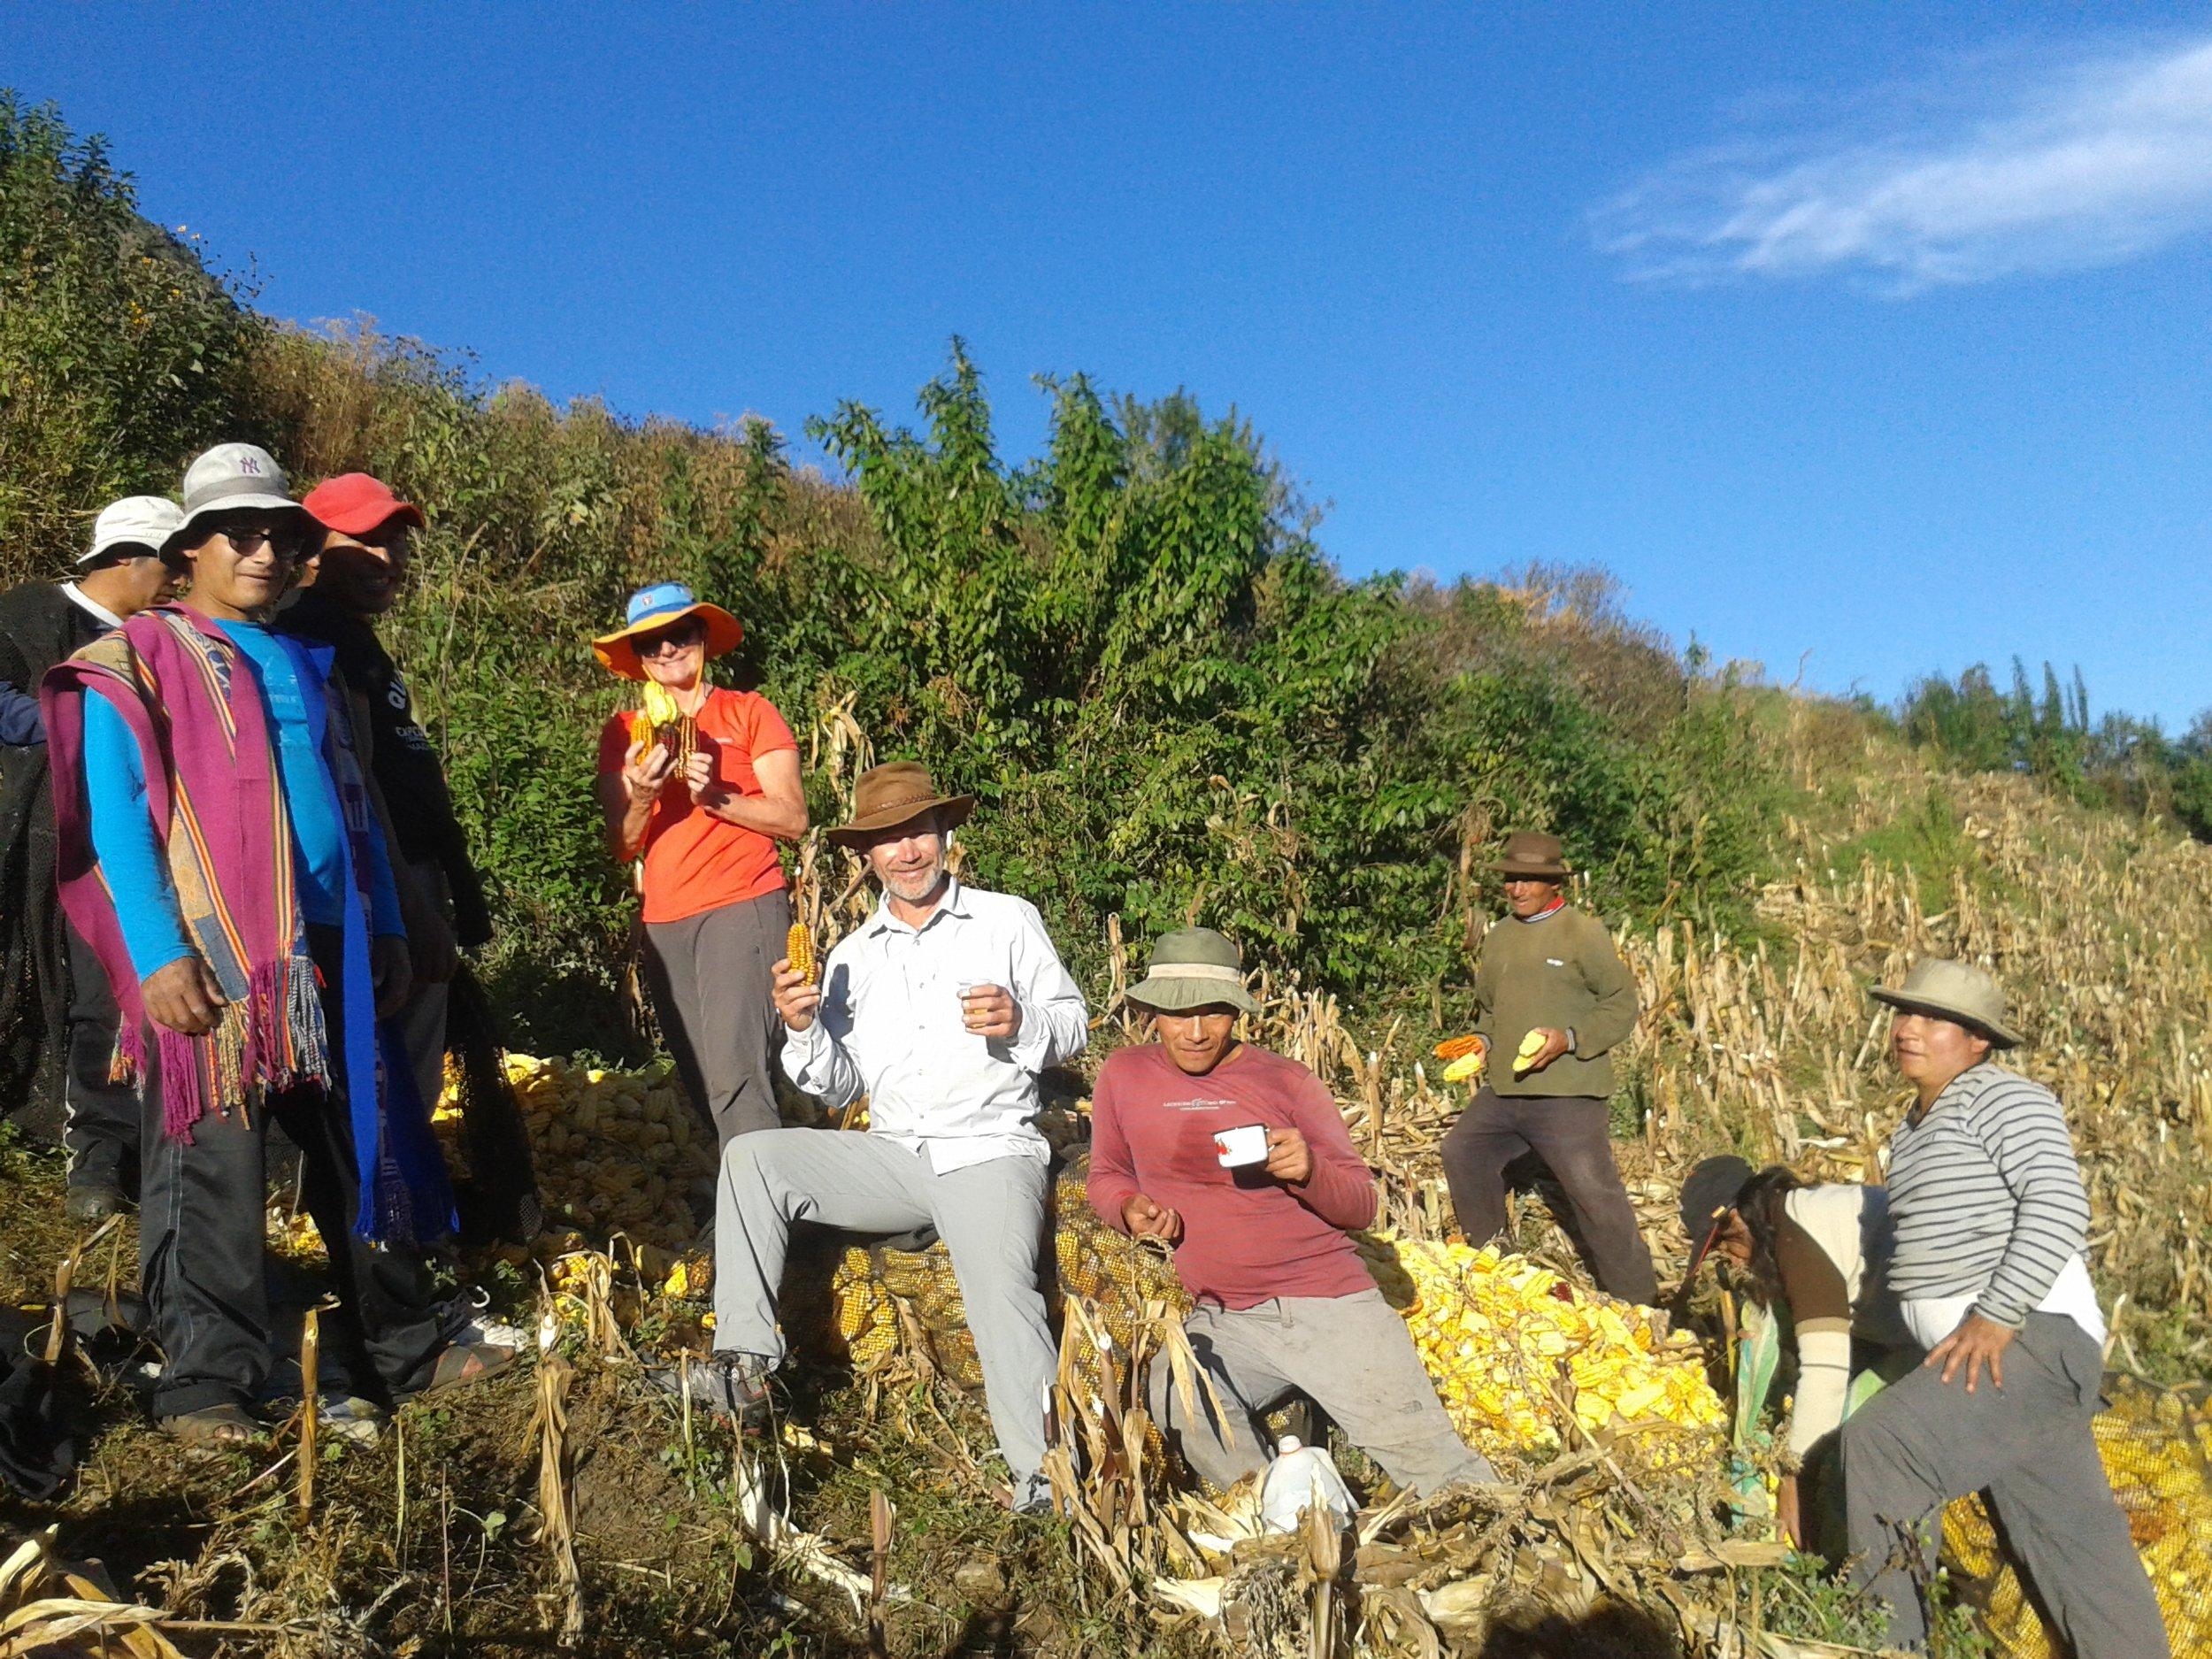 Quechua_Peru_Peruvian_Work_Farming_Sustainable_Tourism.jpg